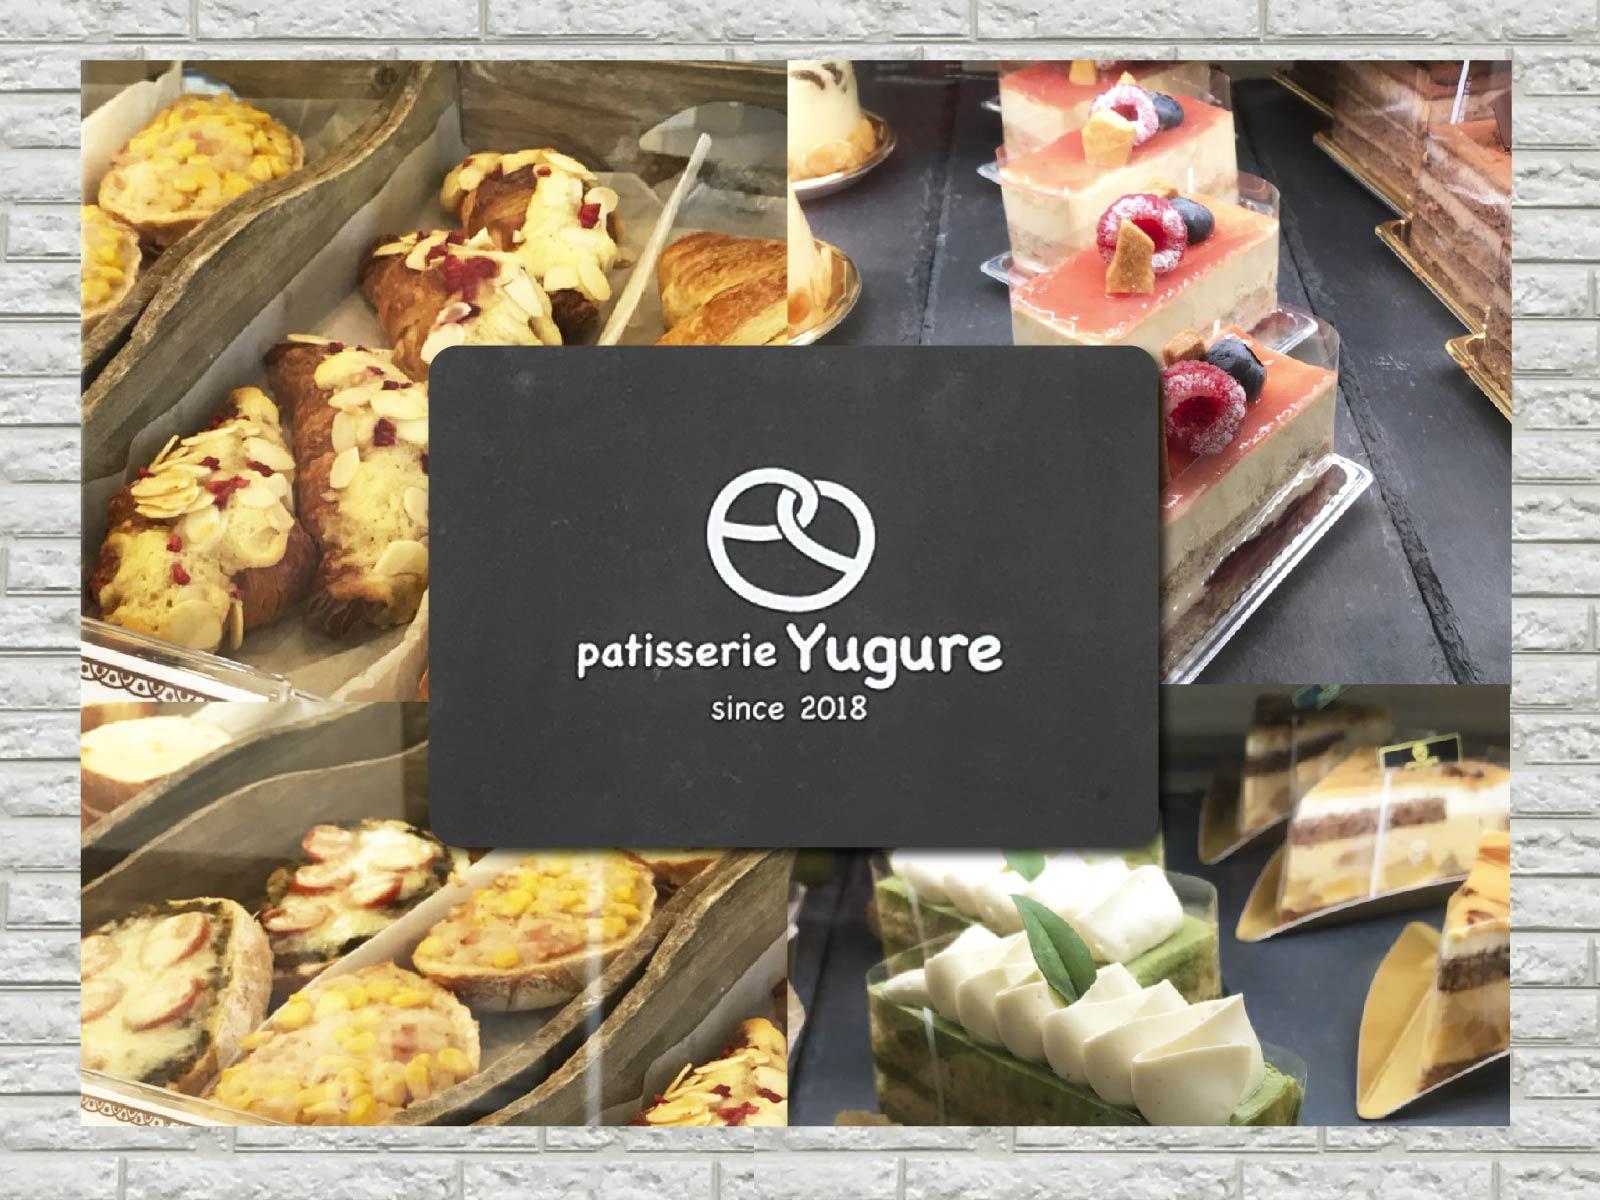 [patisserie  Yugure(パティスリー ユウグレ)]~夕暮れ時に出来たてのパンとケーキでお迎えします~